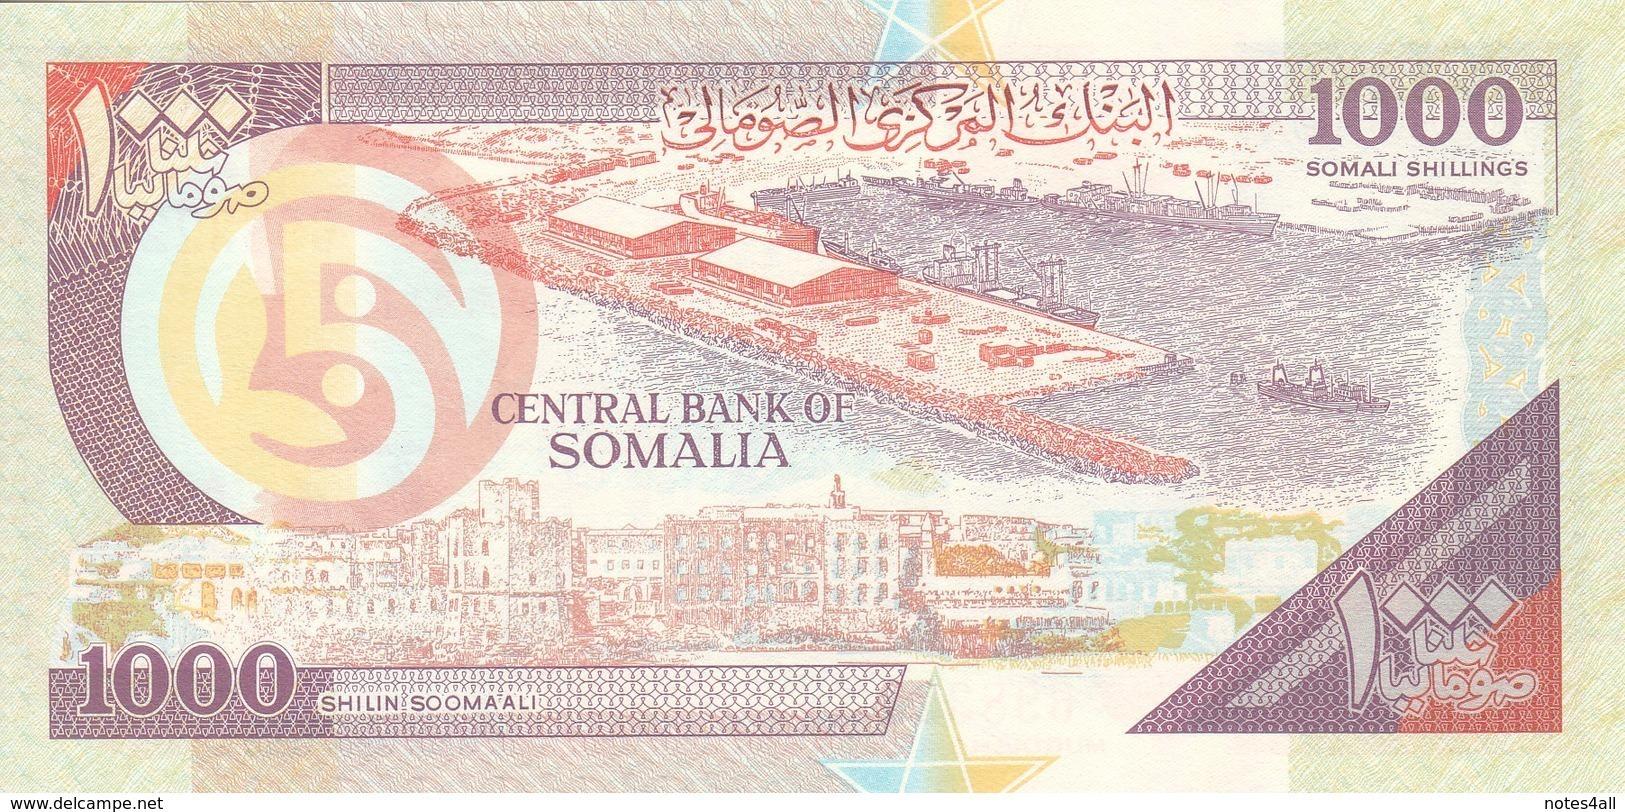 SOMALIA 1000 SHILLINGS 1990 (2000)  P-R10 Serie 460 PUNTLAND REGION LITHOGRAPHED - Somalia